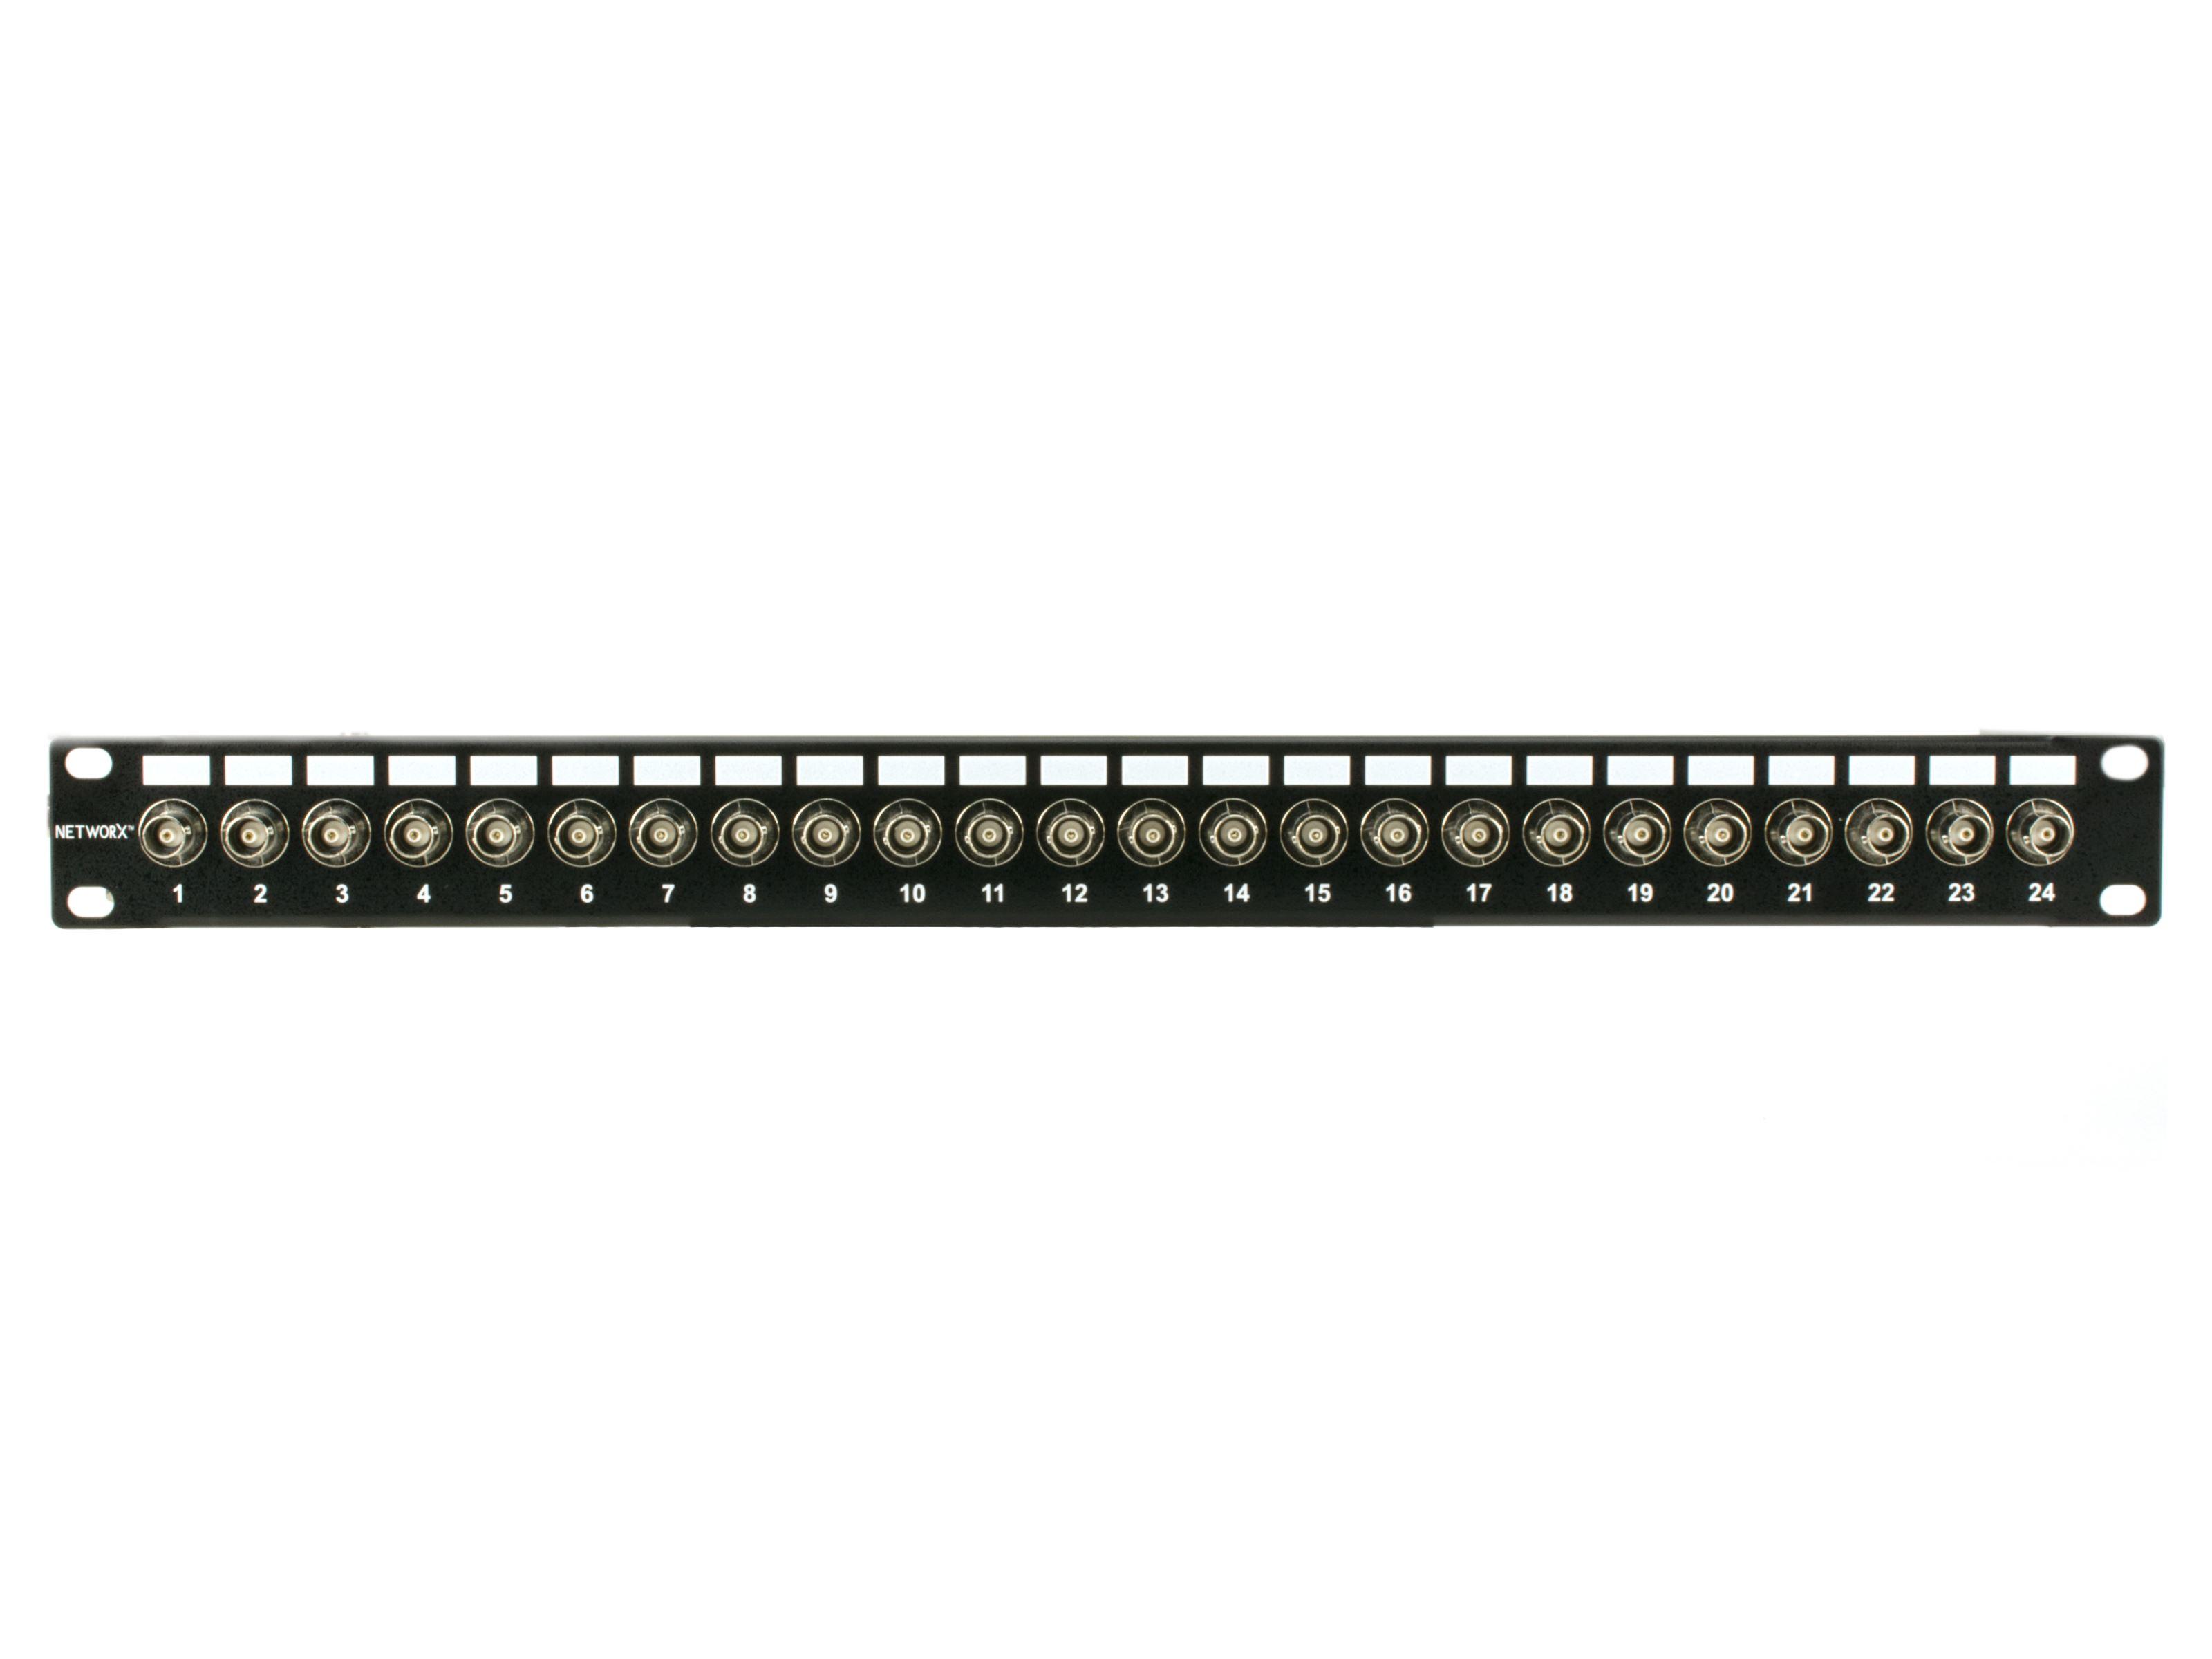 1RU 16-Port Blank BNC Rack Mount Panel Lifetime Warranty